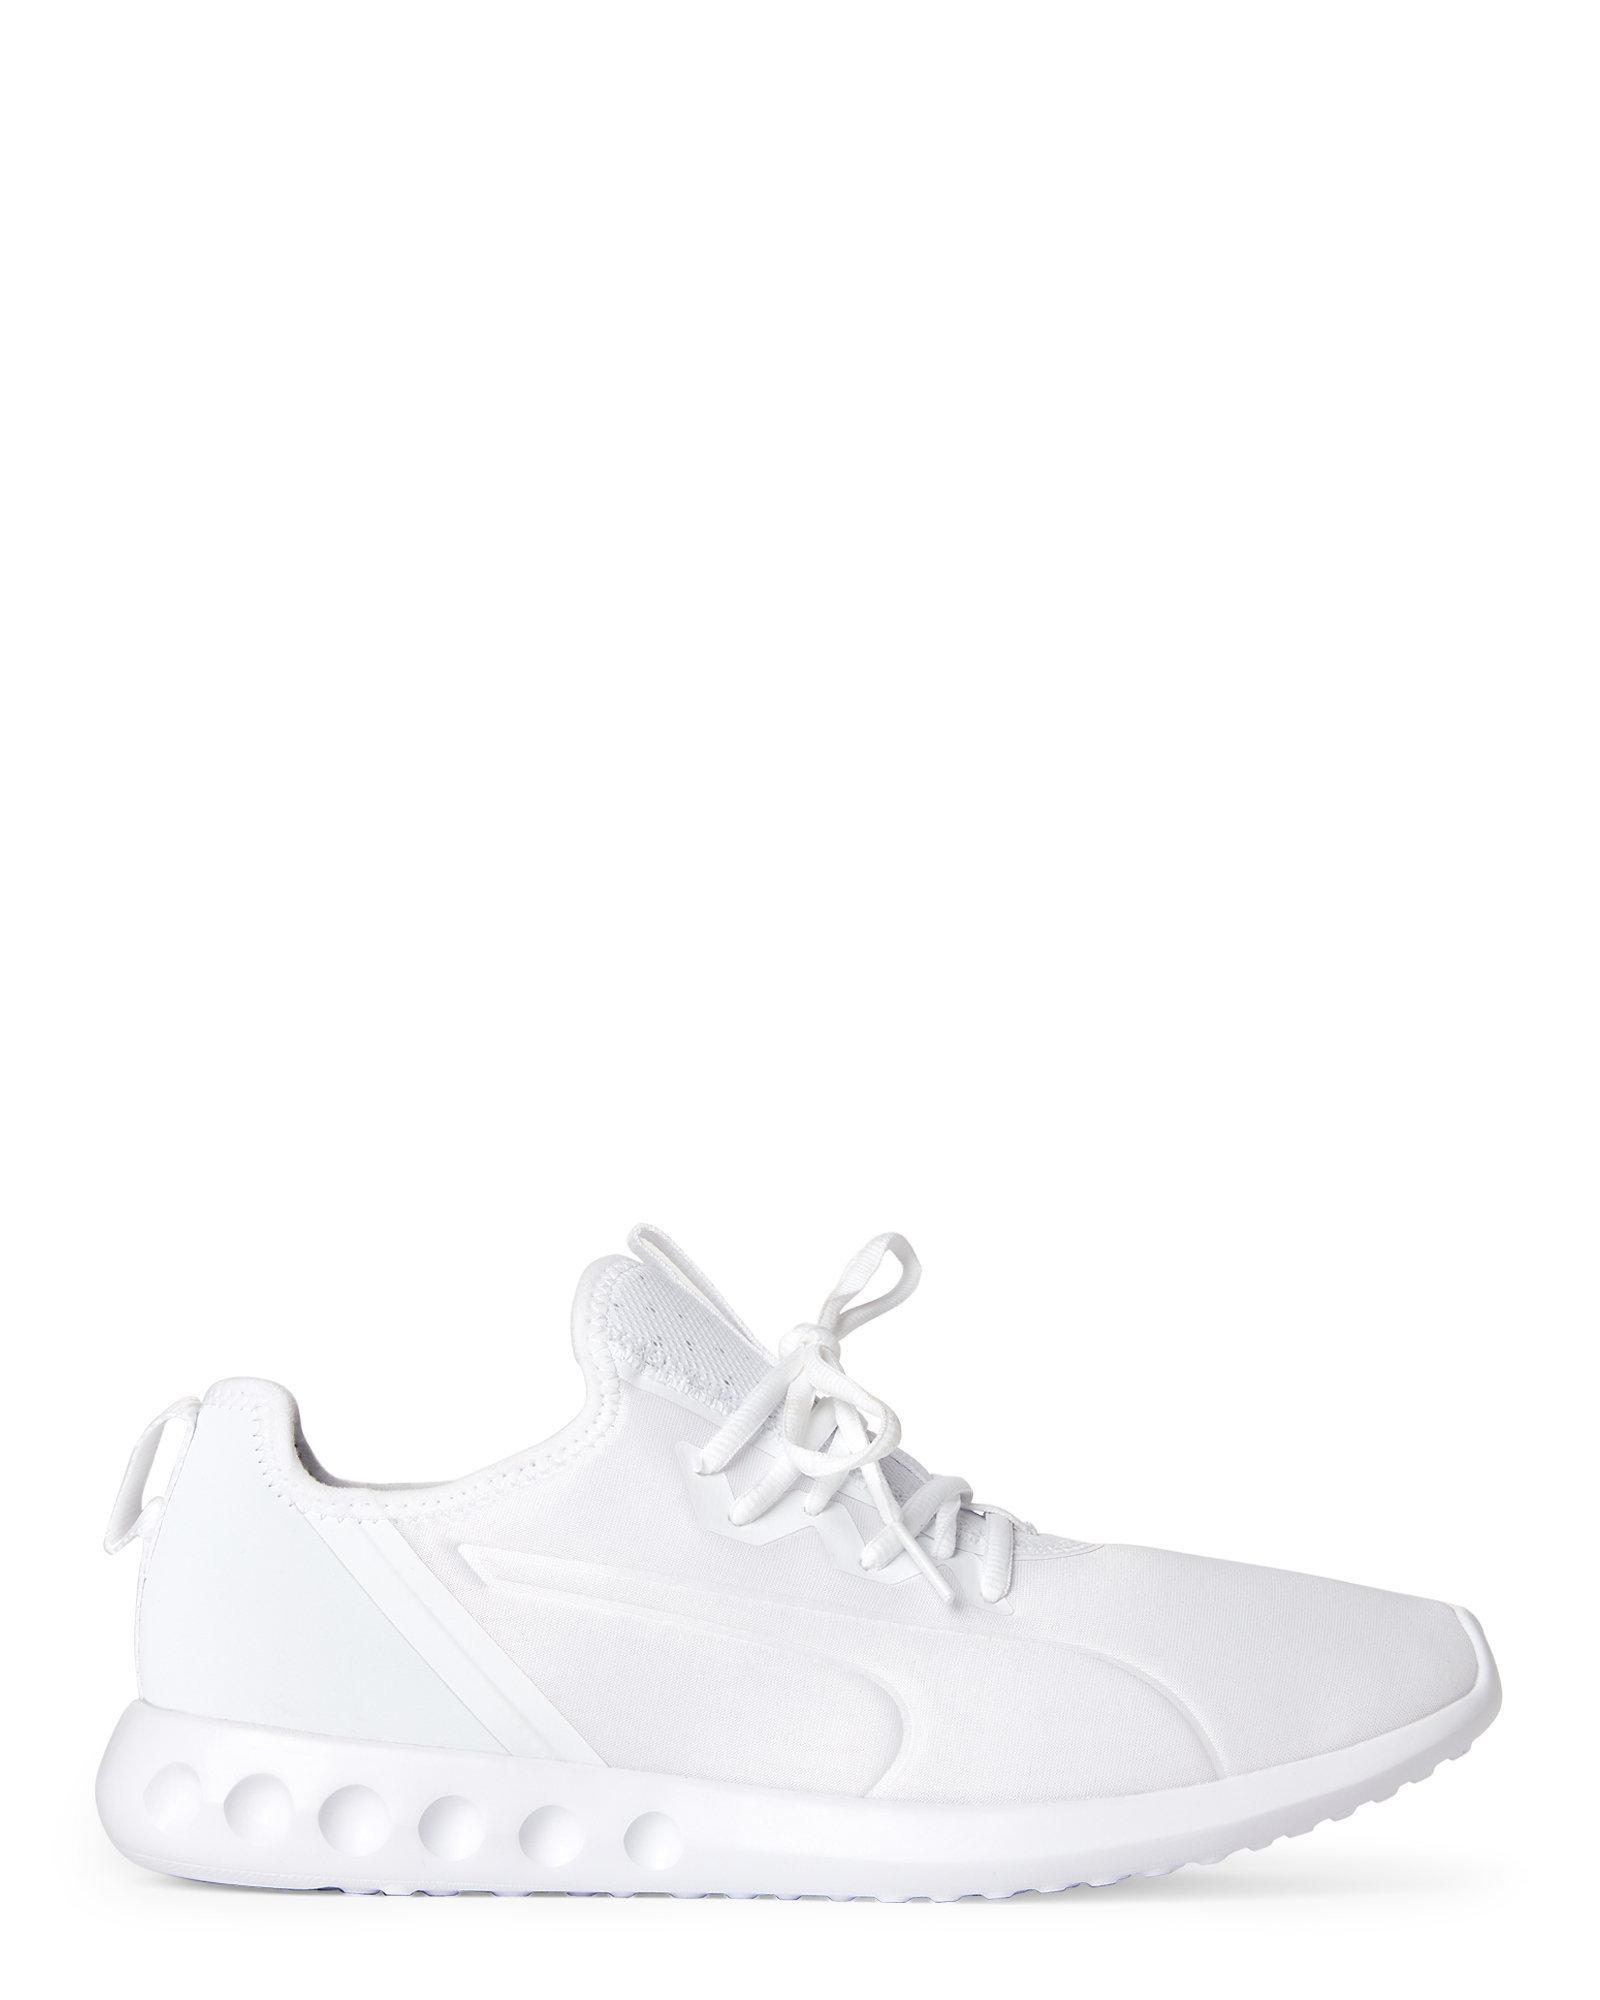 Lyst - Puma White Carson 2 Running Sneakers in White for Men cb8d9f1c3